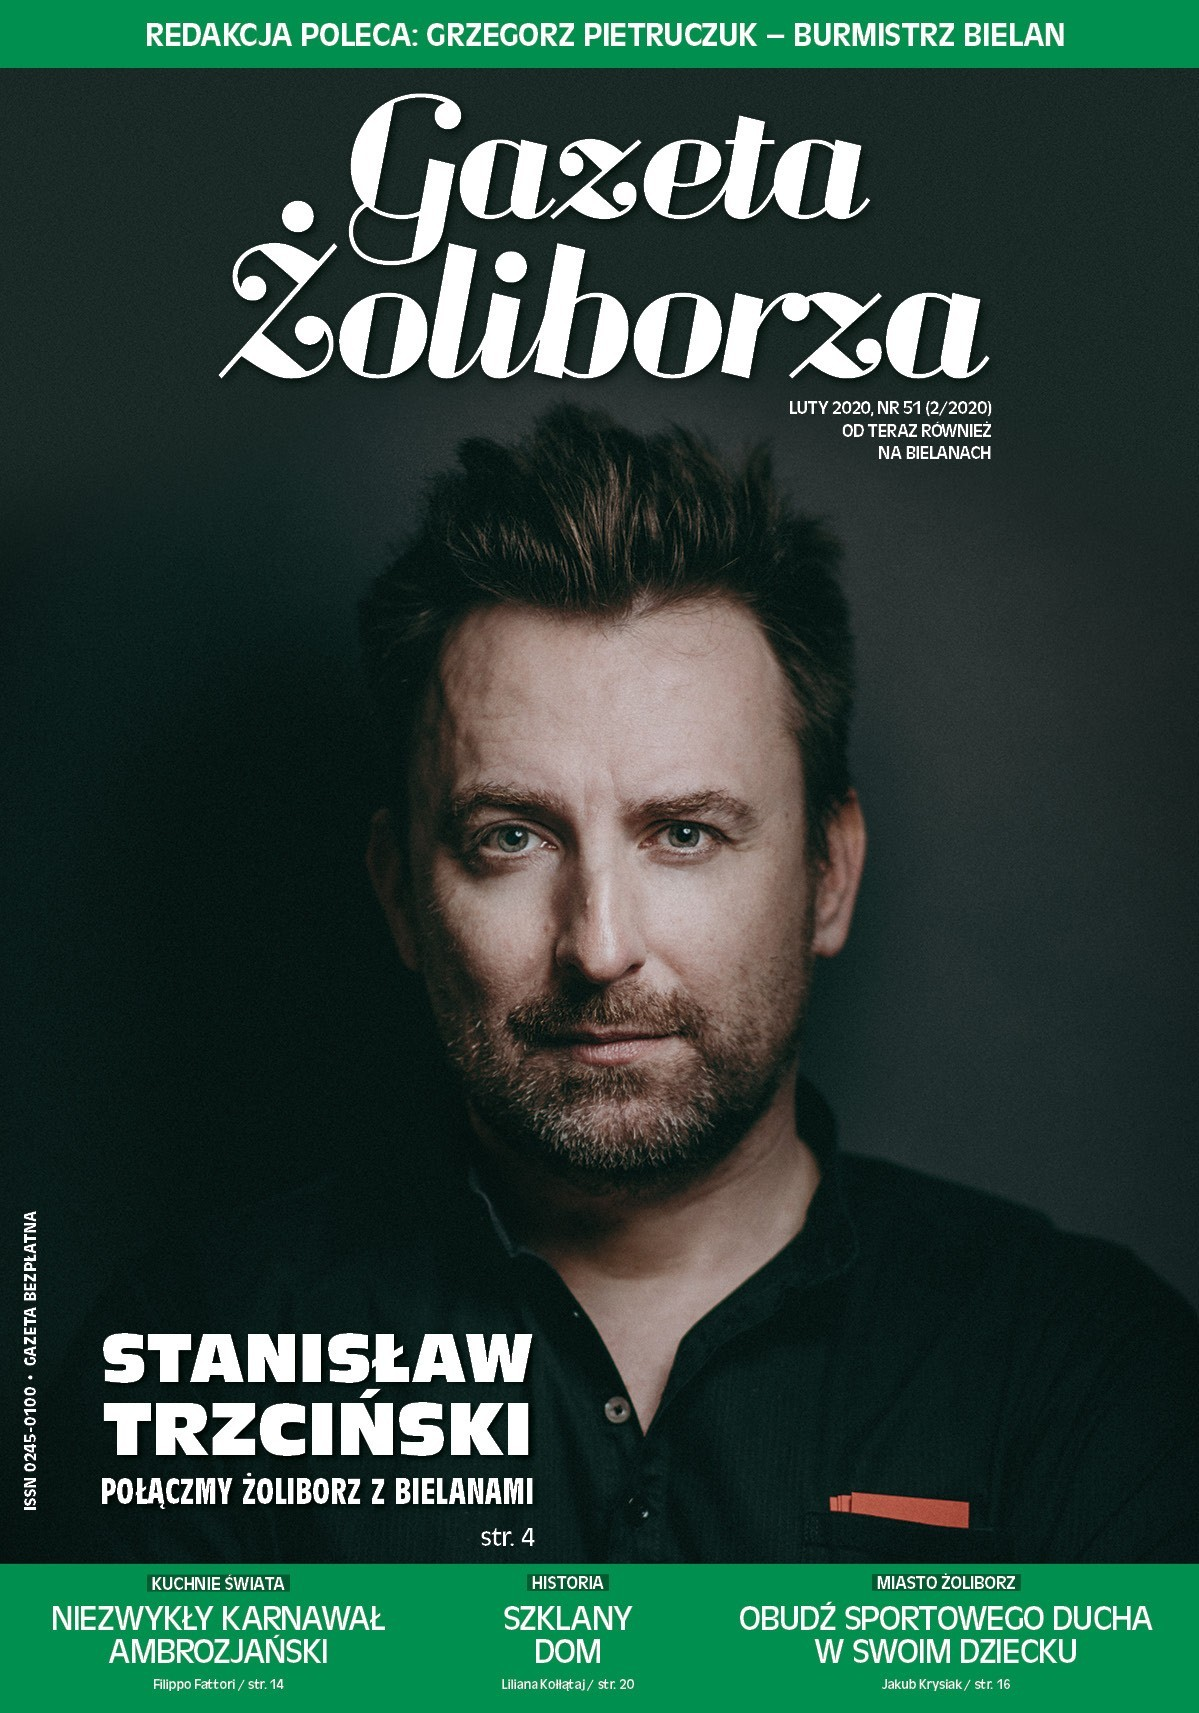 Gazeta Żoliborza - 2/2020 (51)